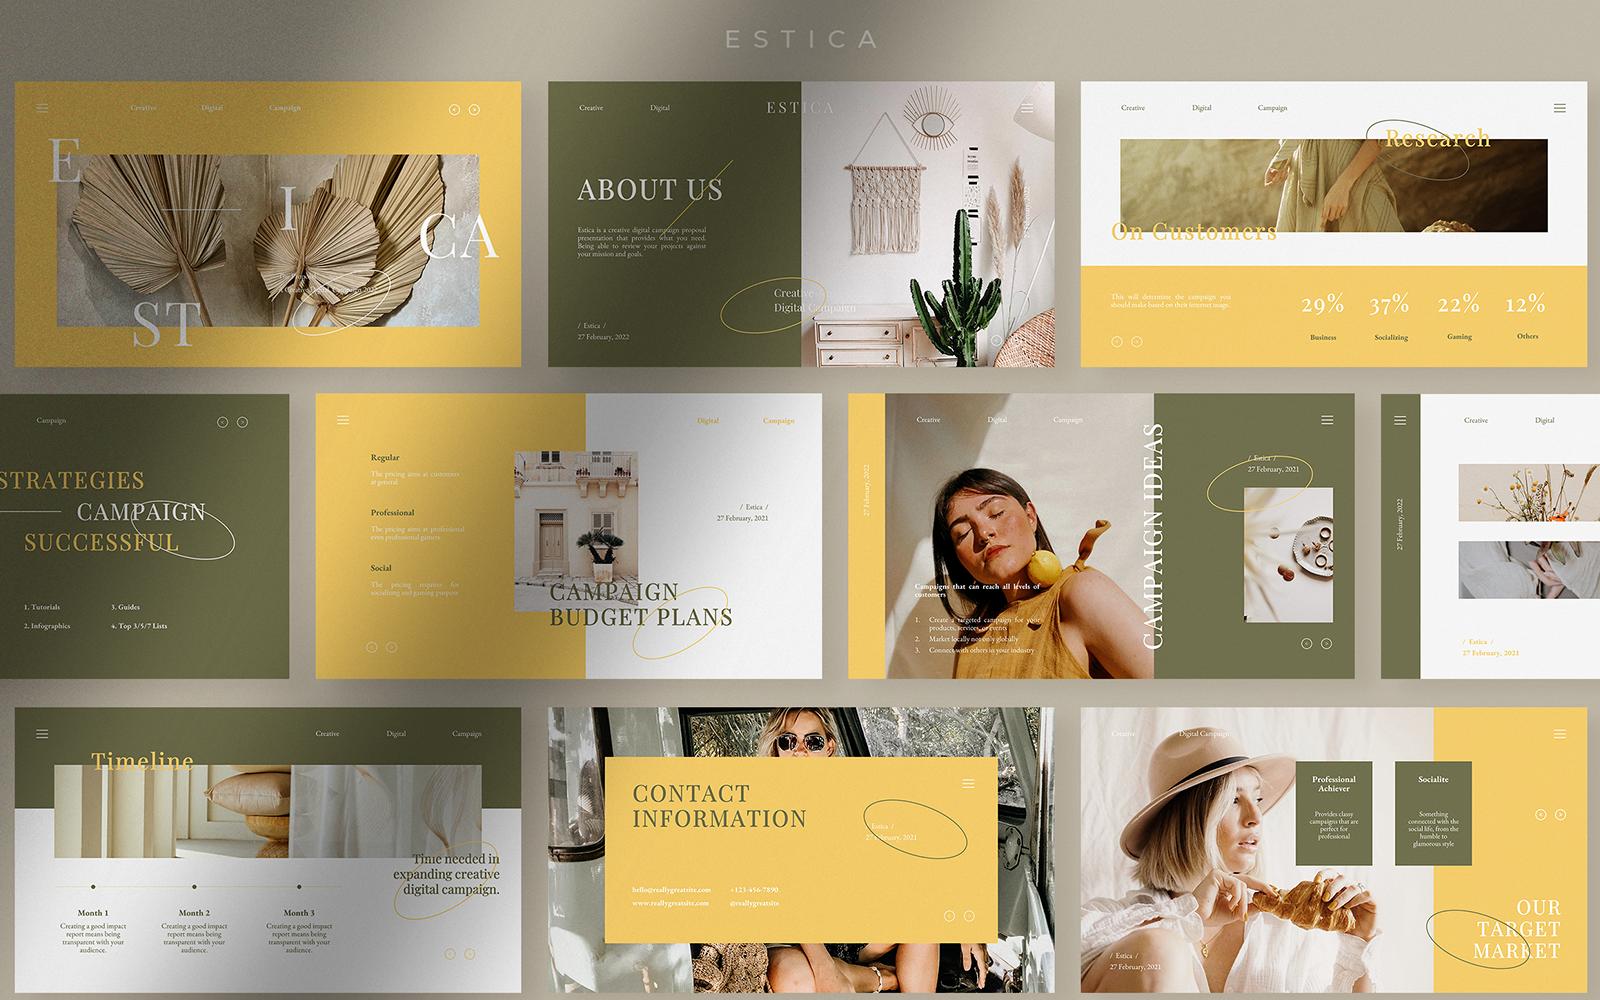 Estica - Creative Digital Campaign